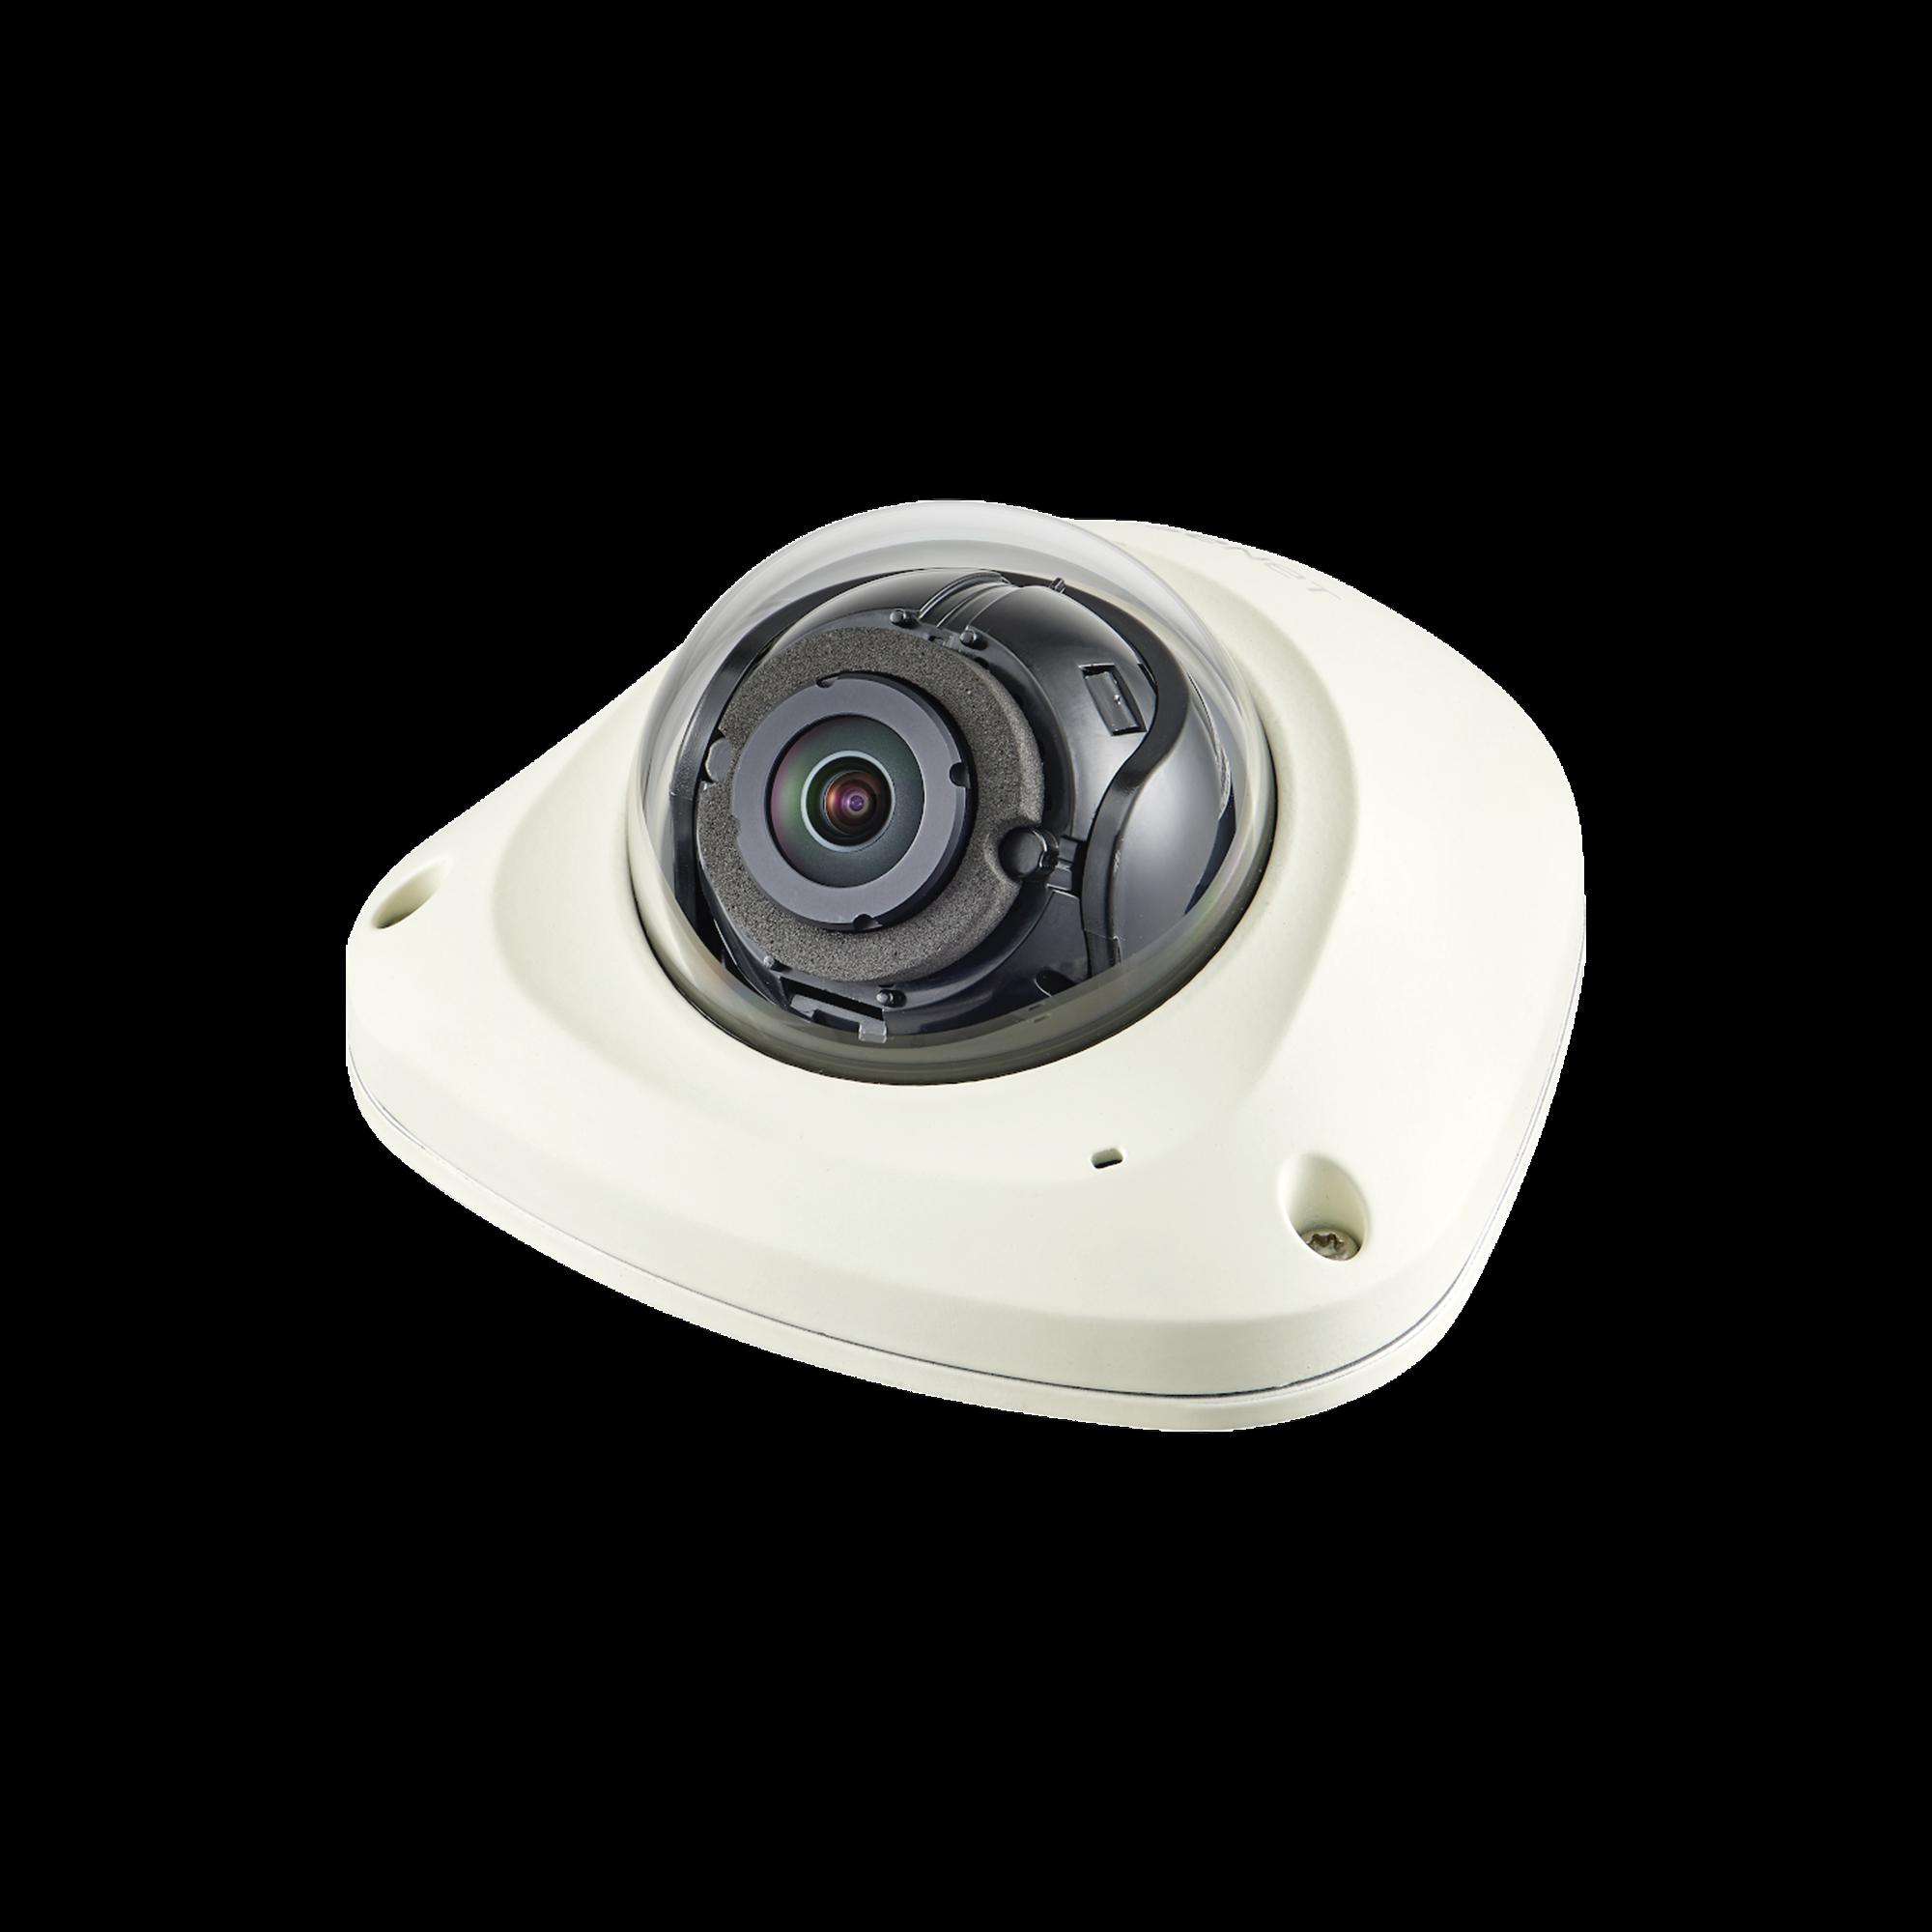 Cámara IP Mini Domo Antivandálica 2MP / Lente 2.4mm / WDR 150db / IP66 / H.265 & WiseStream II